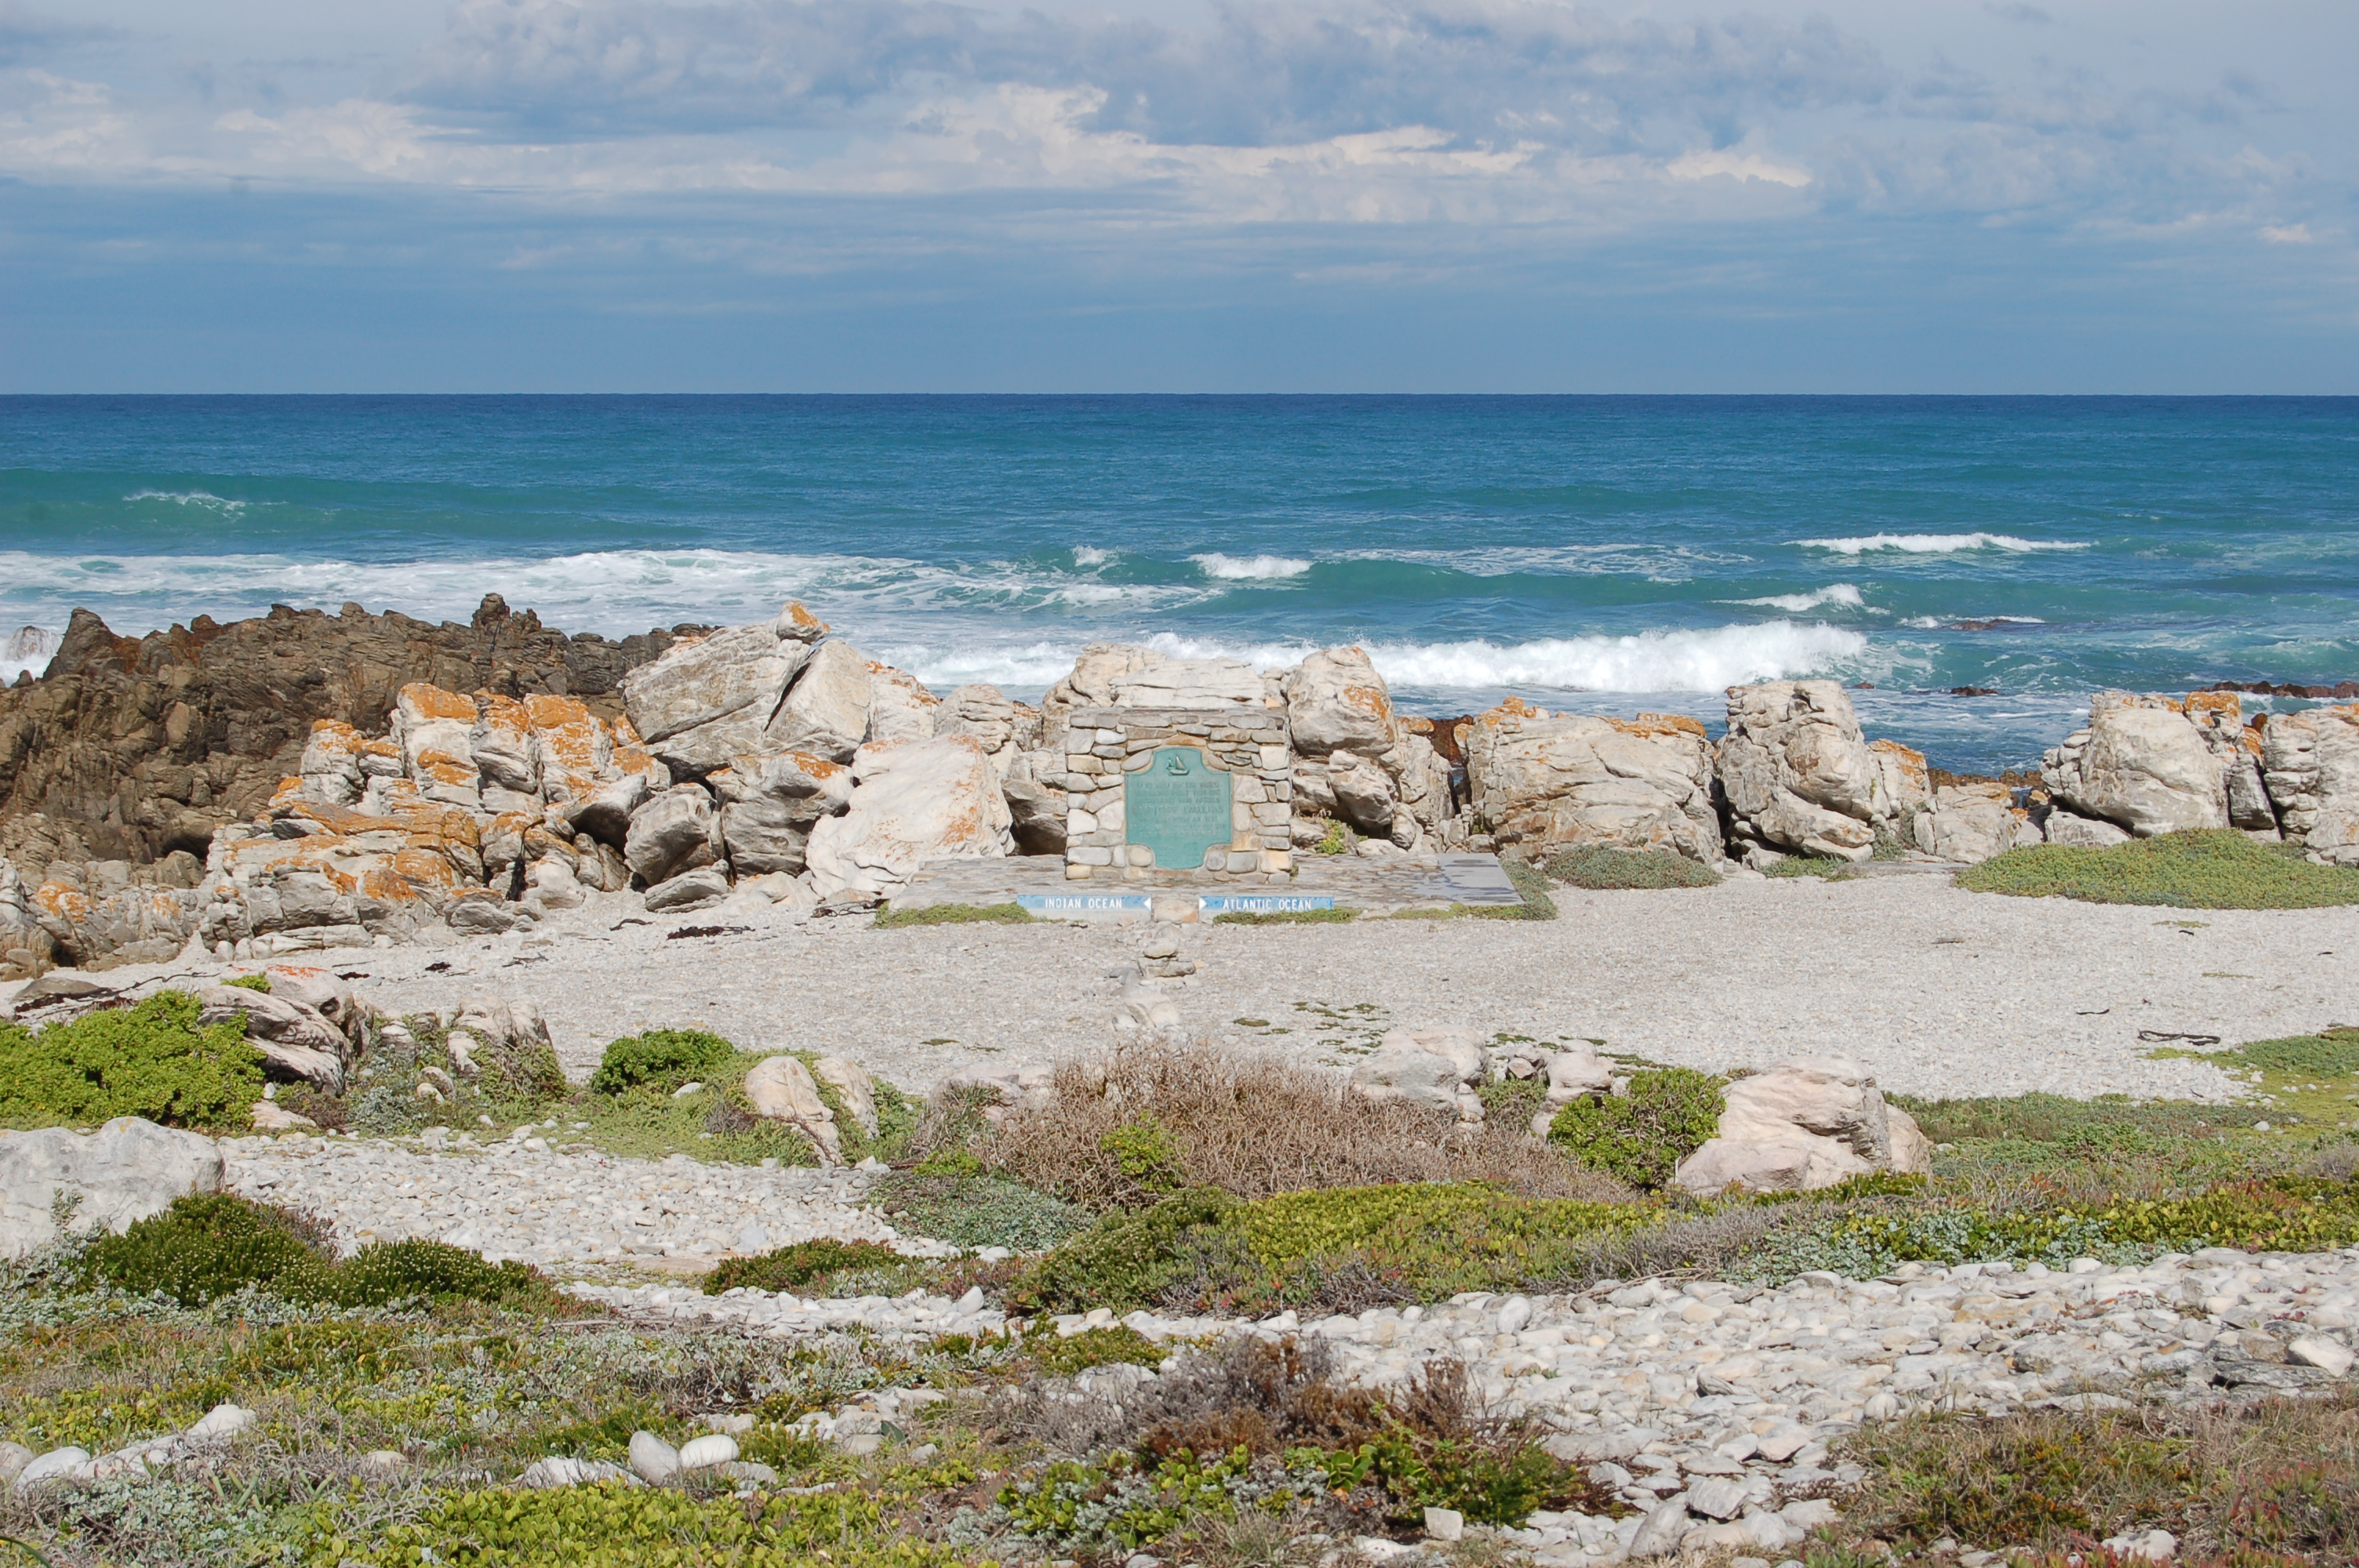 File:Cape Agulhas, South Africa (3225142651).jpg ...